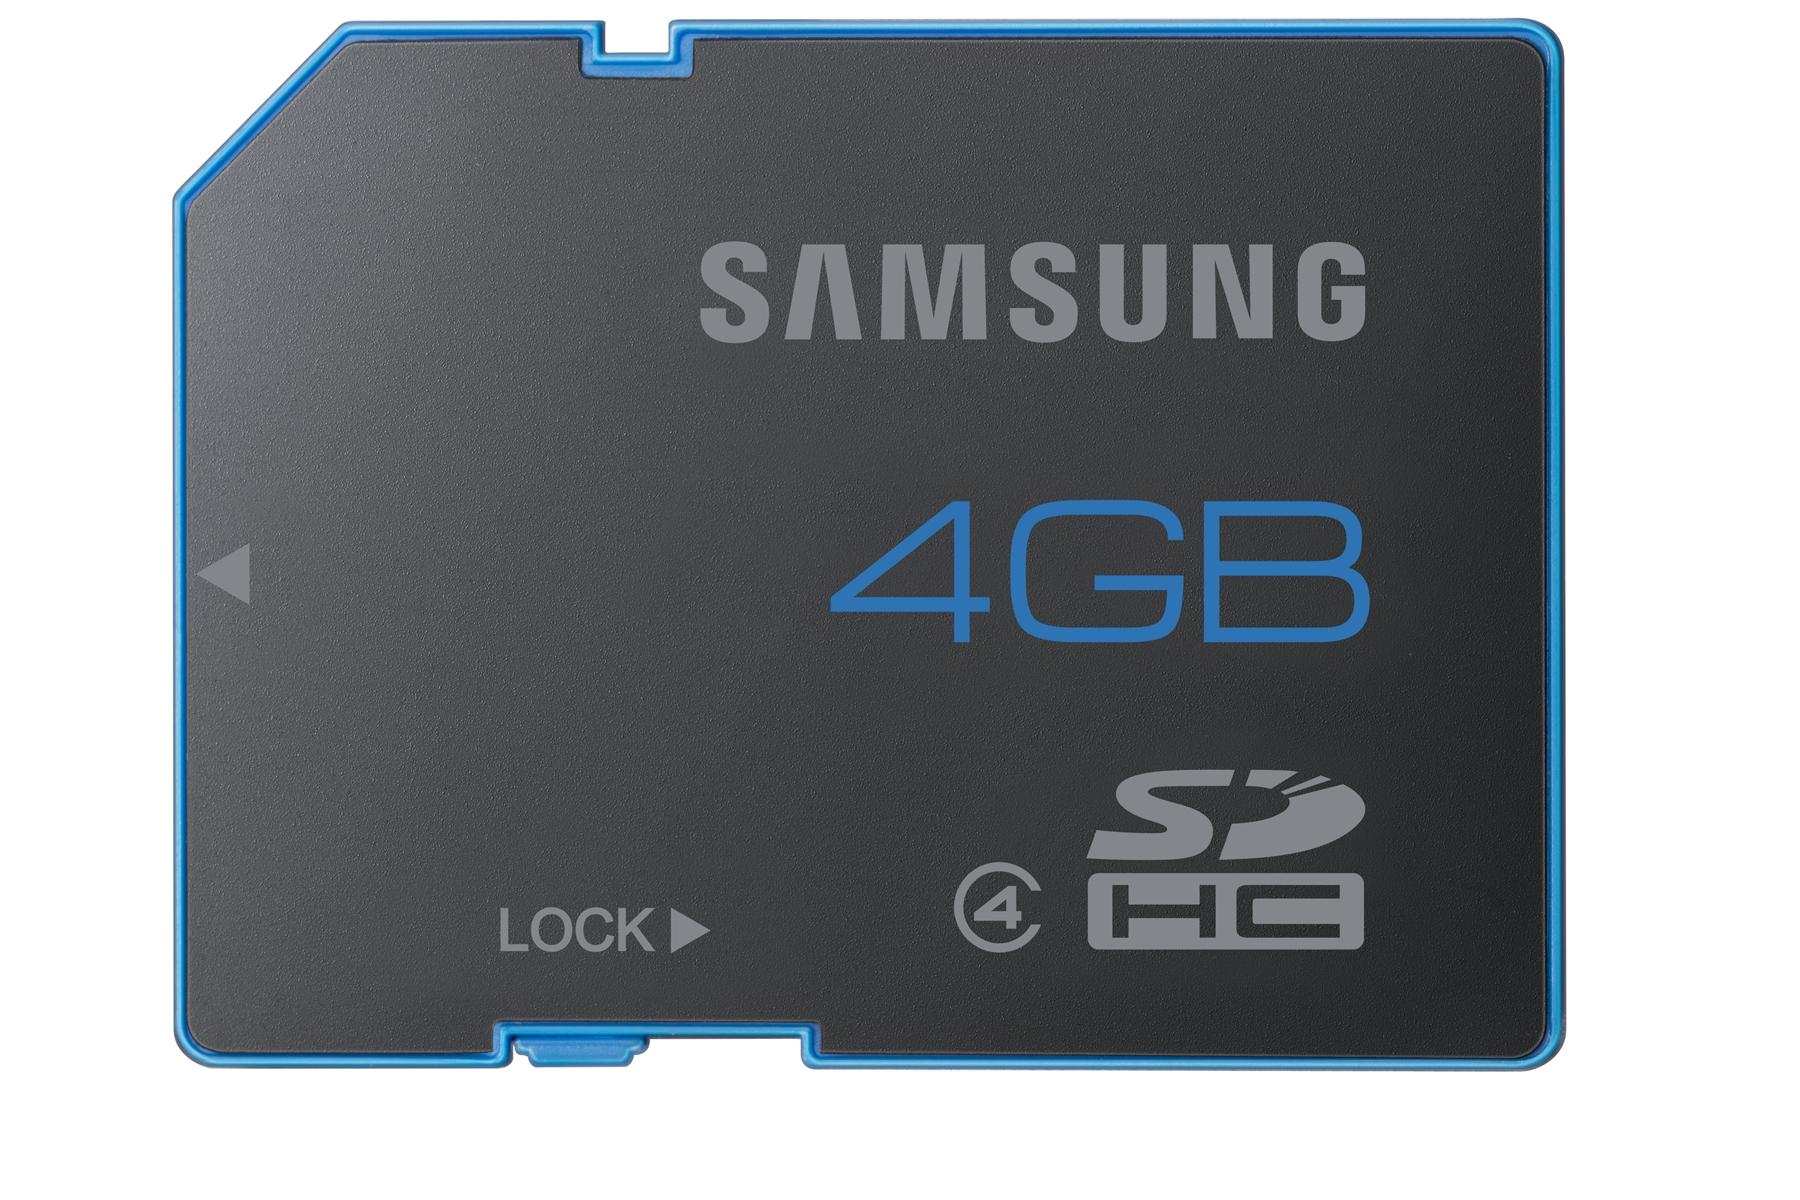 MB-SS4GB 4GB SDHC Class 4 Memory Card front Black